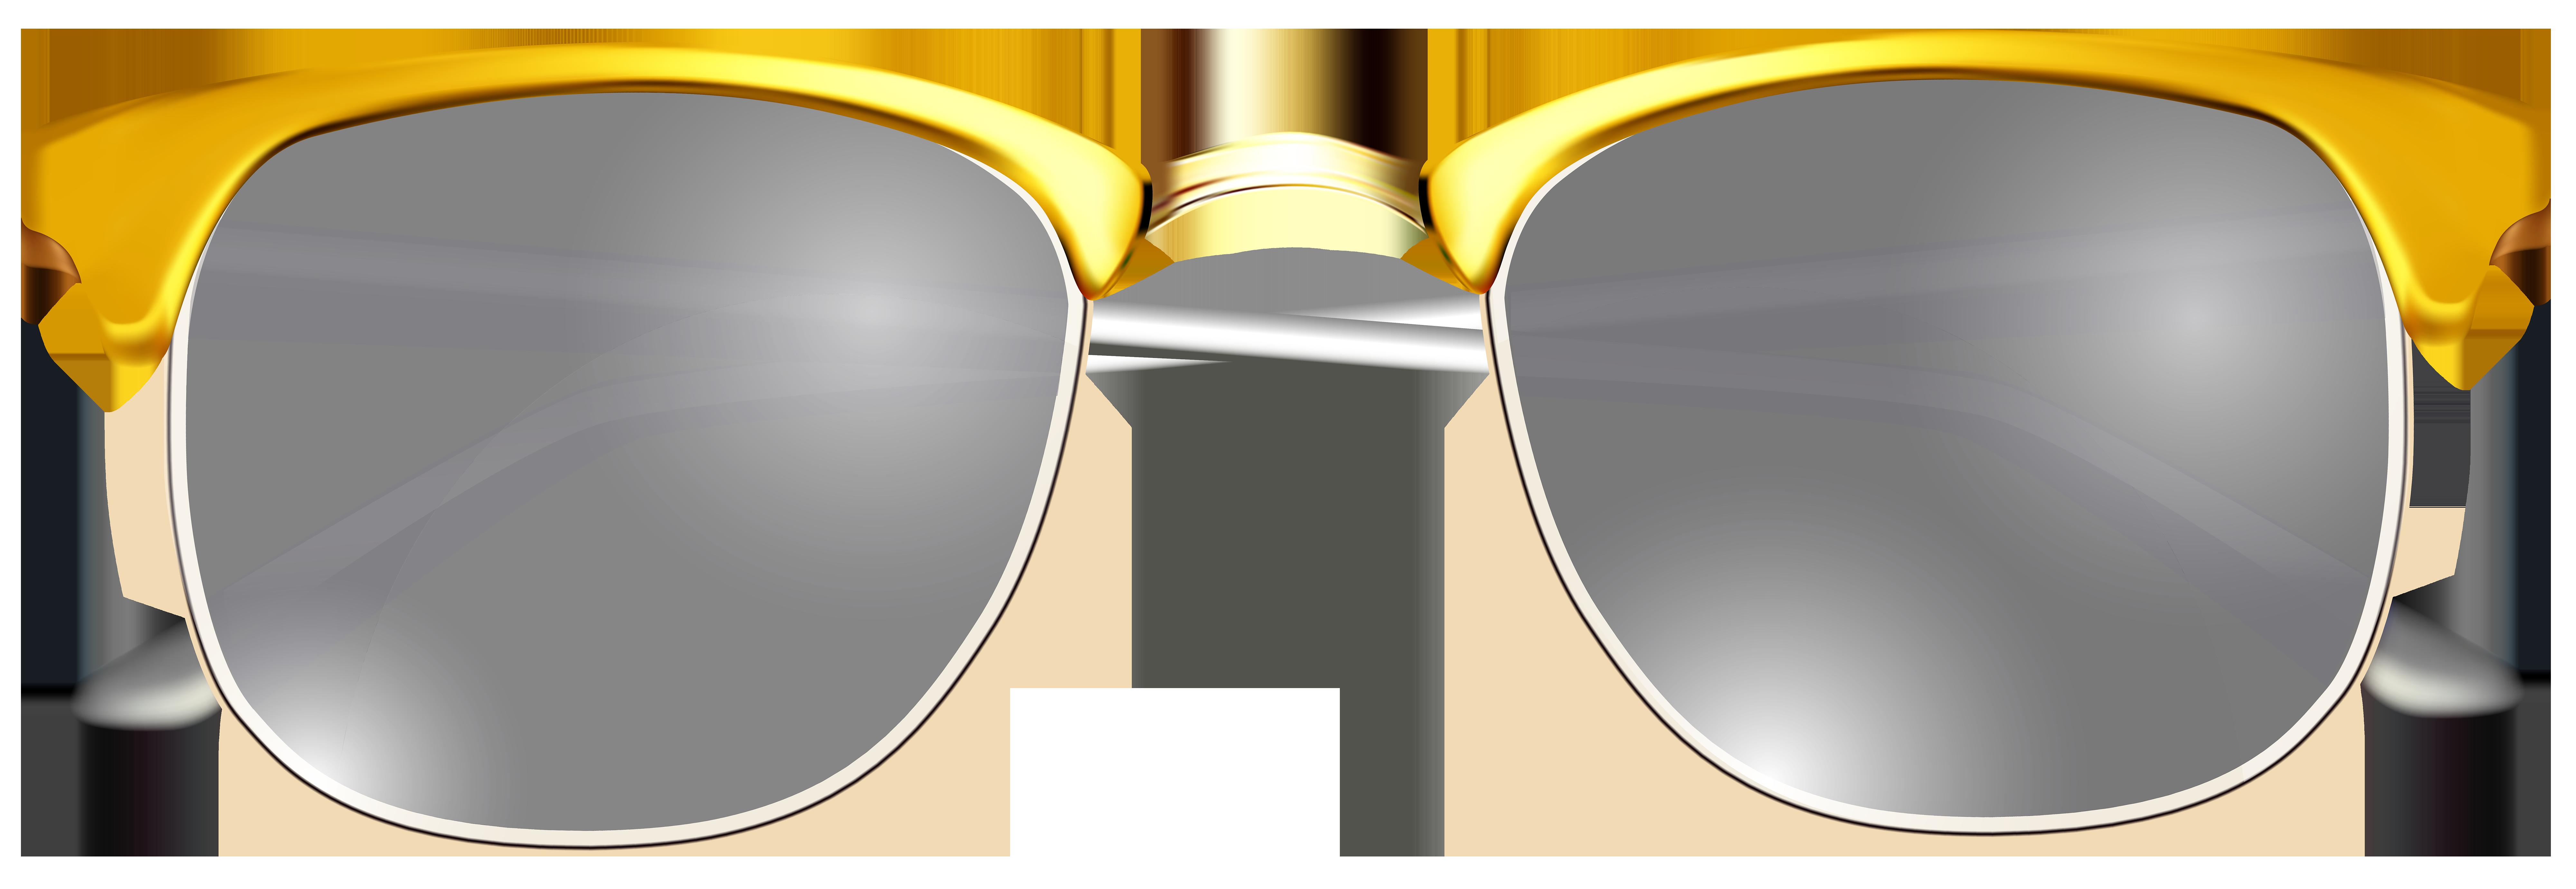 Transparent clip art image. Sunglasses clipart gold